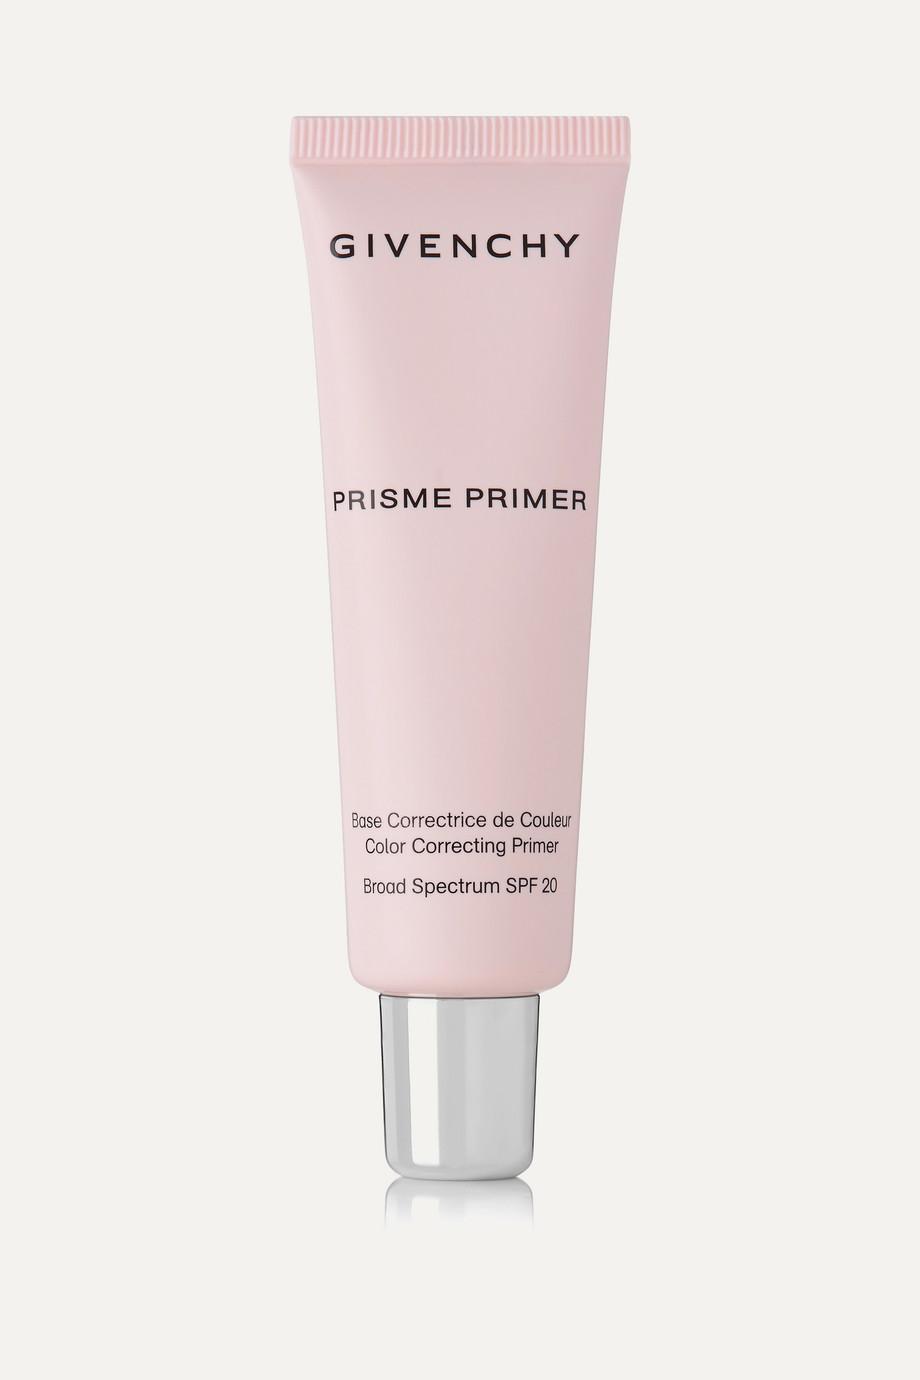 Givenchy Beauty Prisme Primer SPF20 - Rose No. 2, 30ml